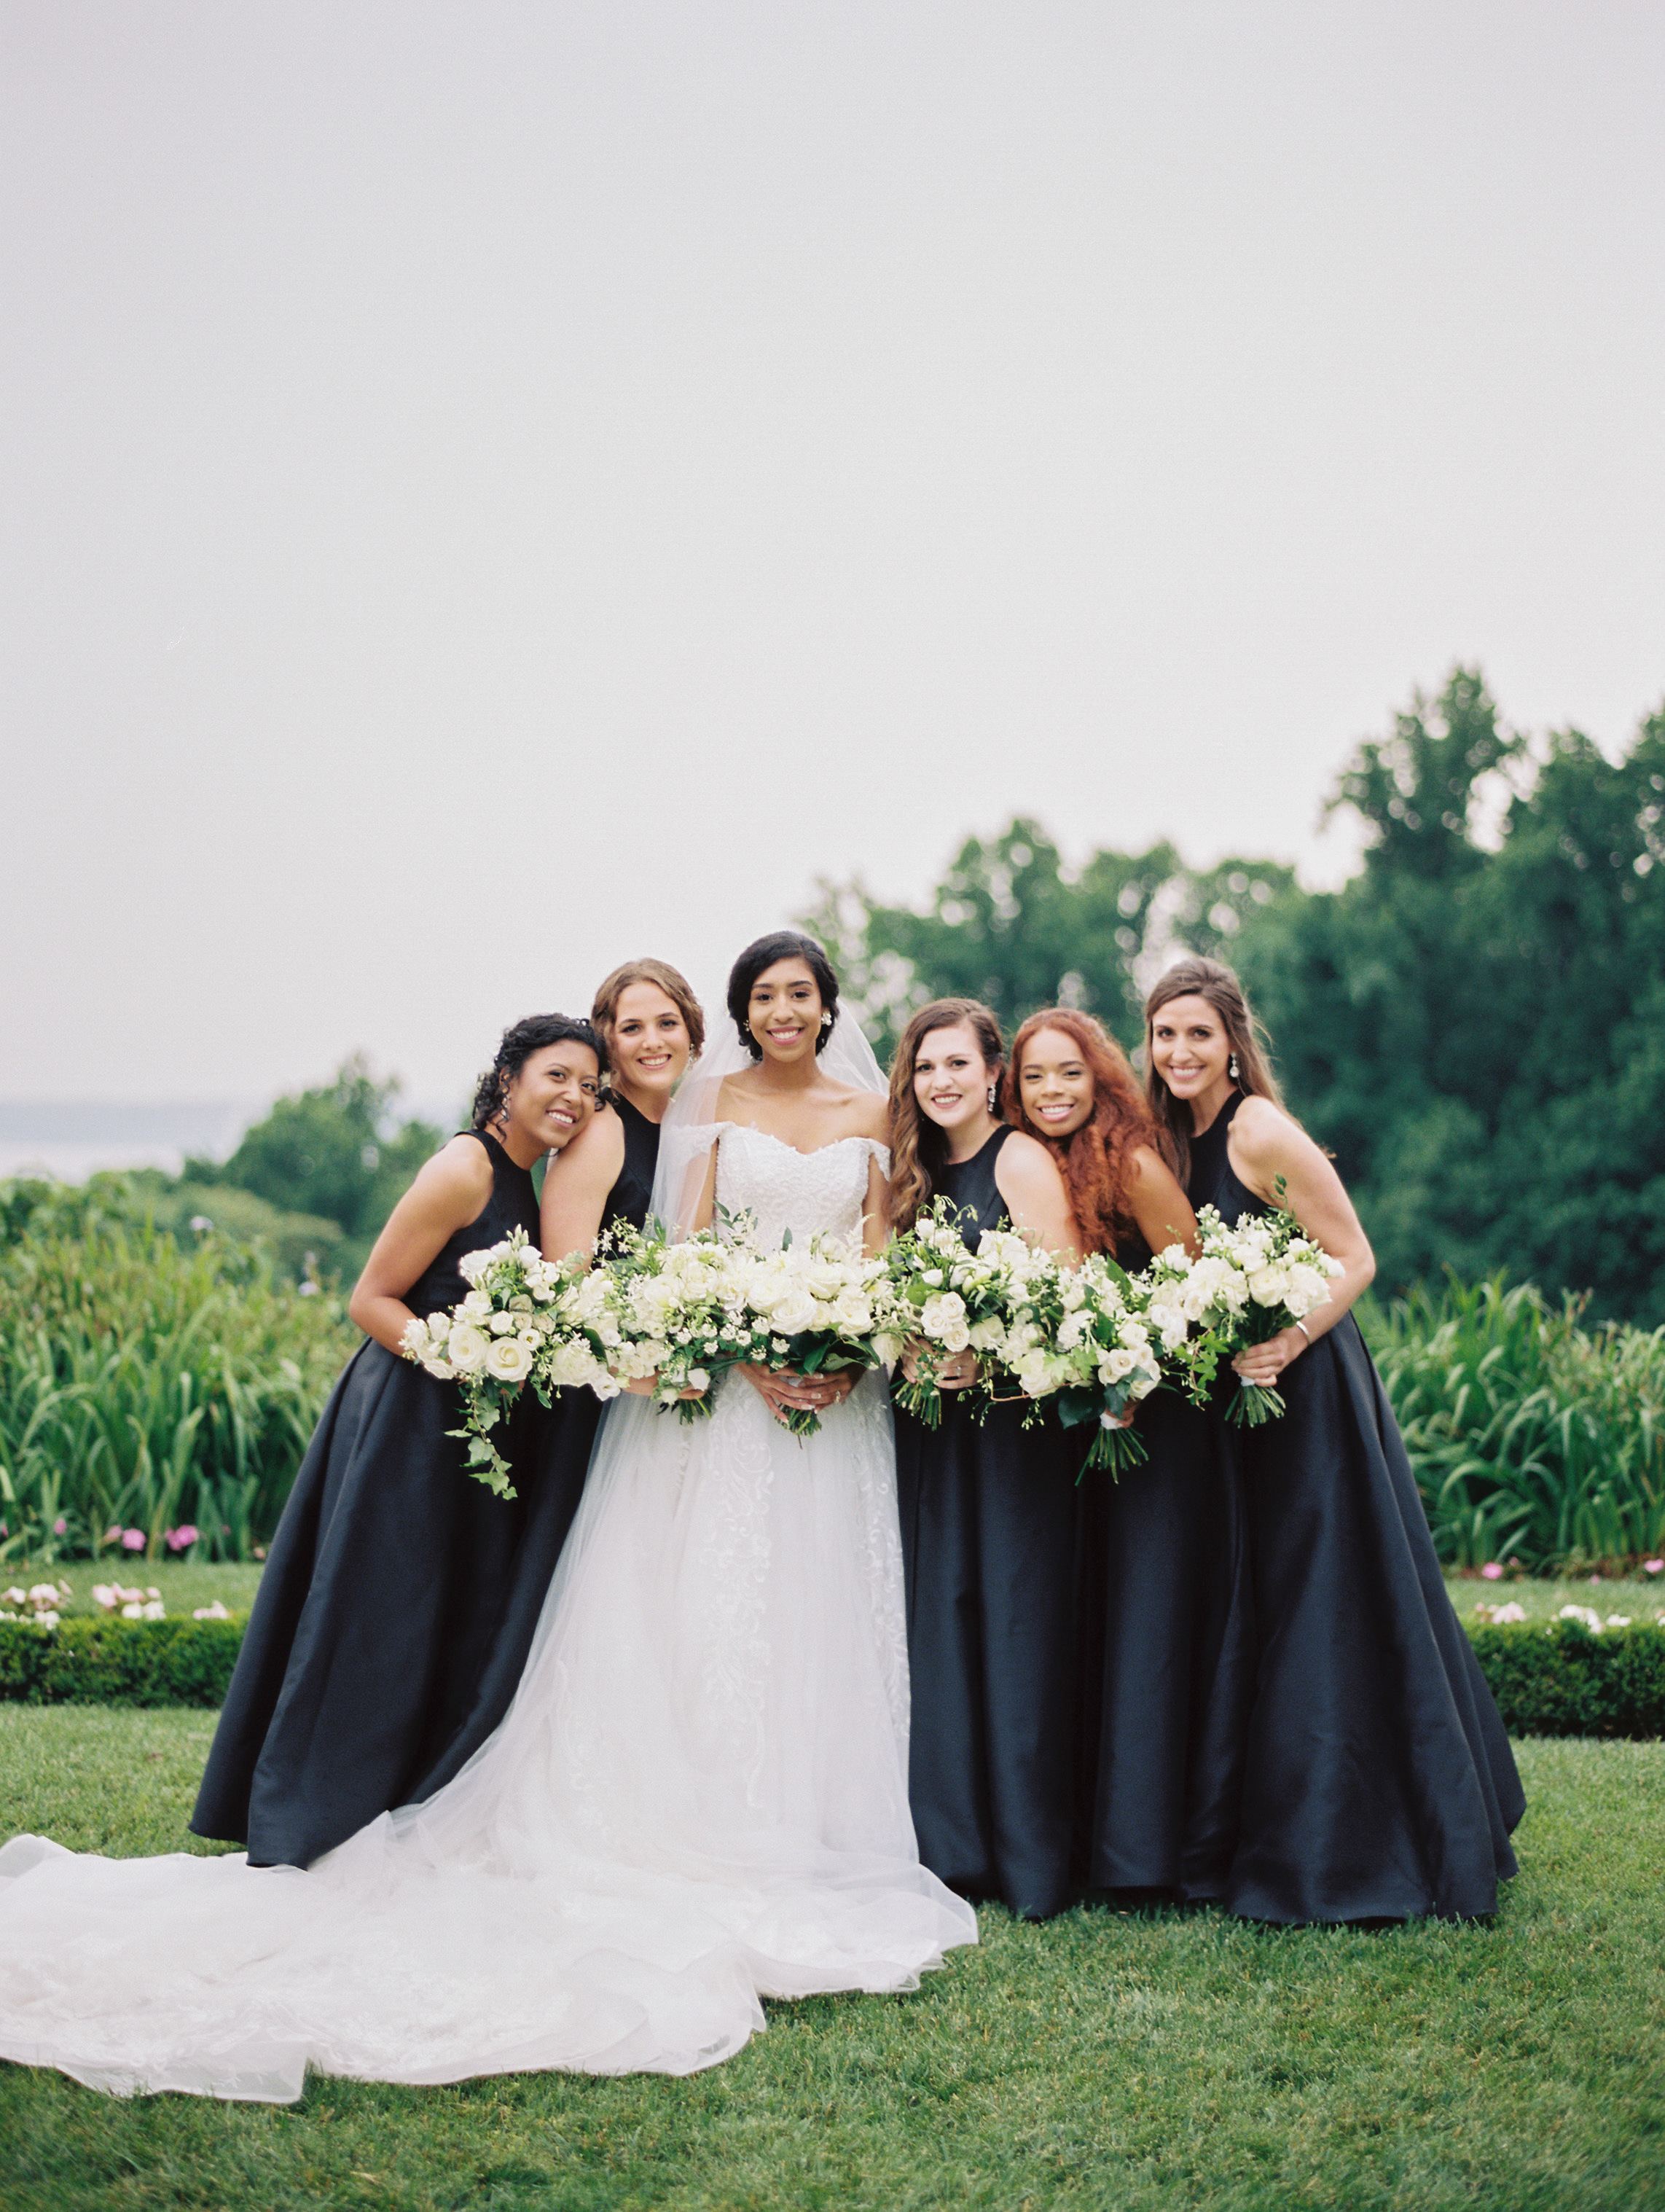 macey joshua wedding bridesmaids in black dresses